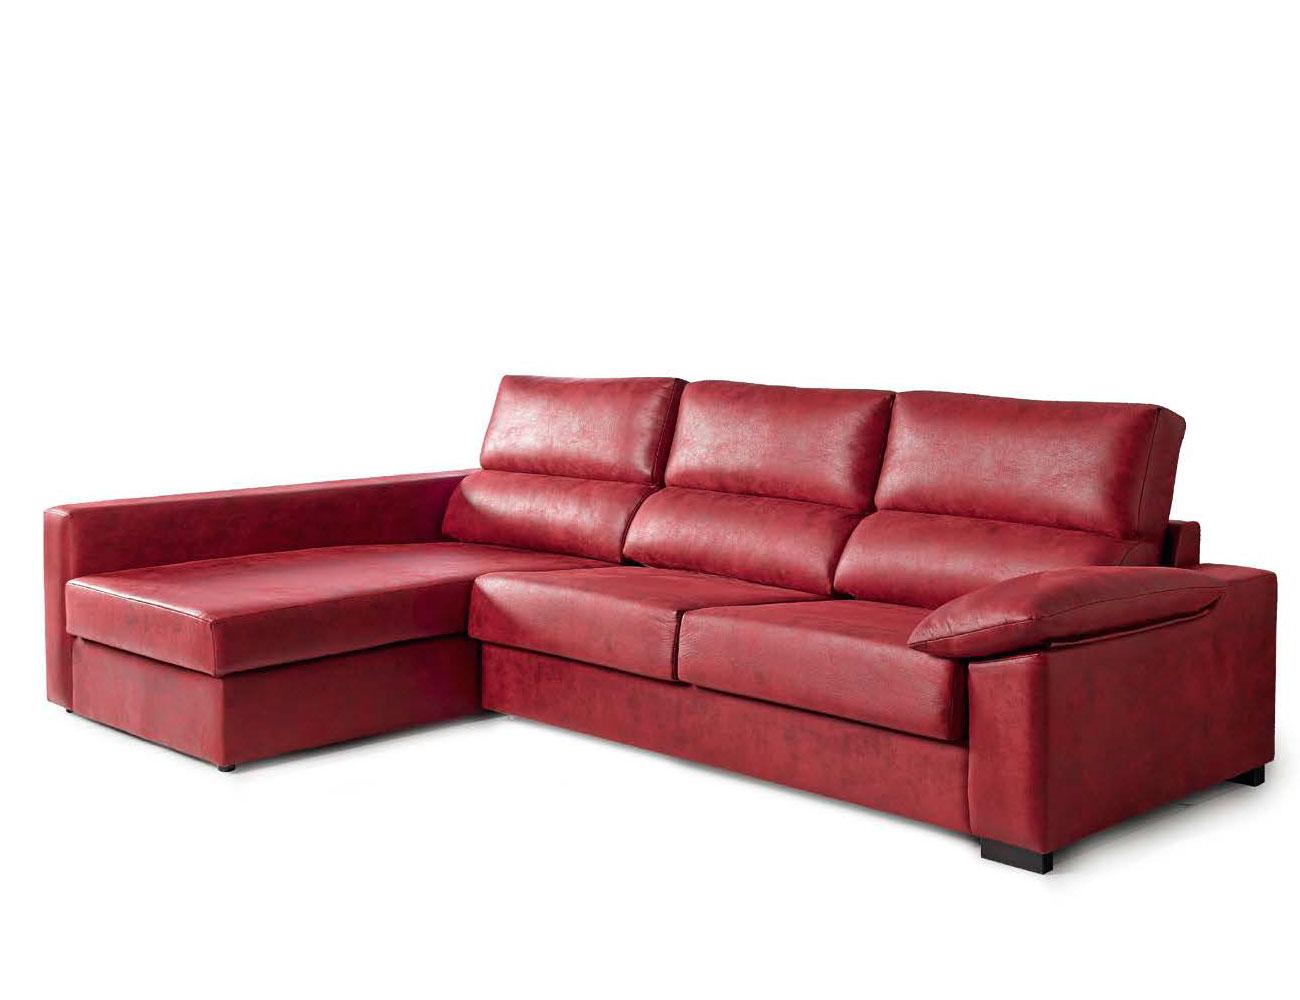 Sofa chaiselongue cama italiana leire rojo 3